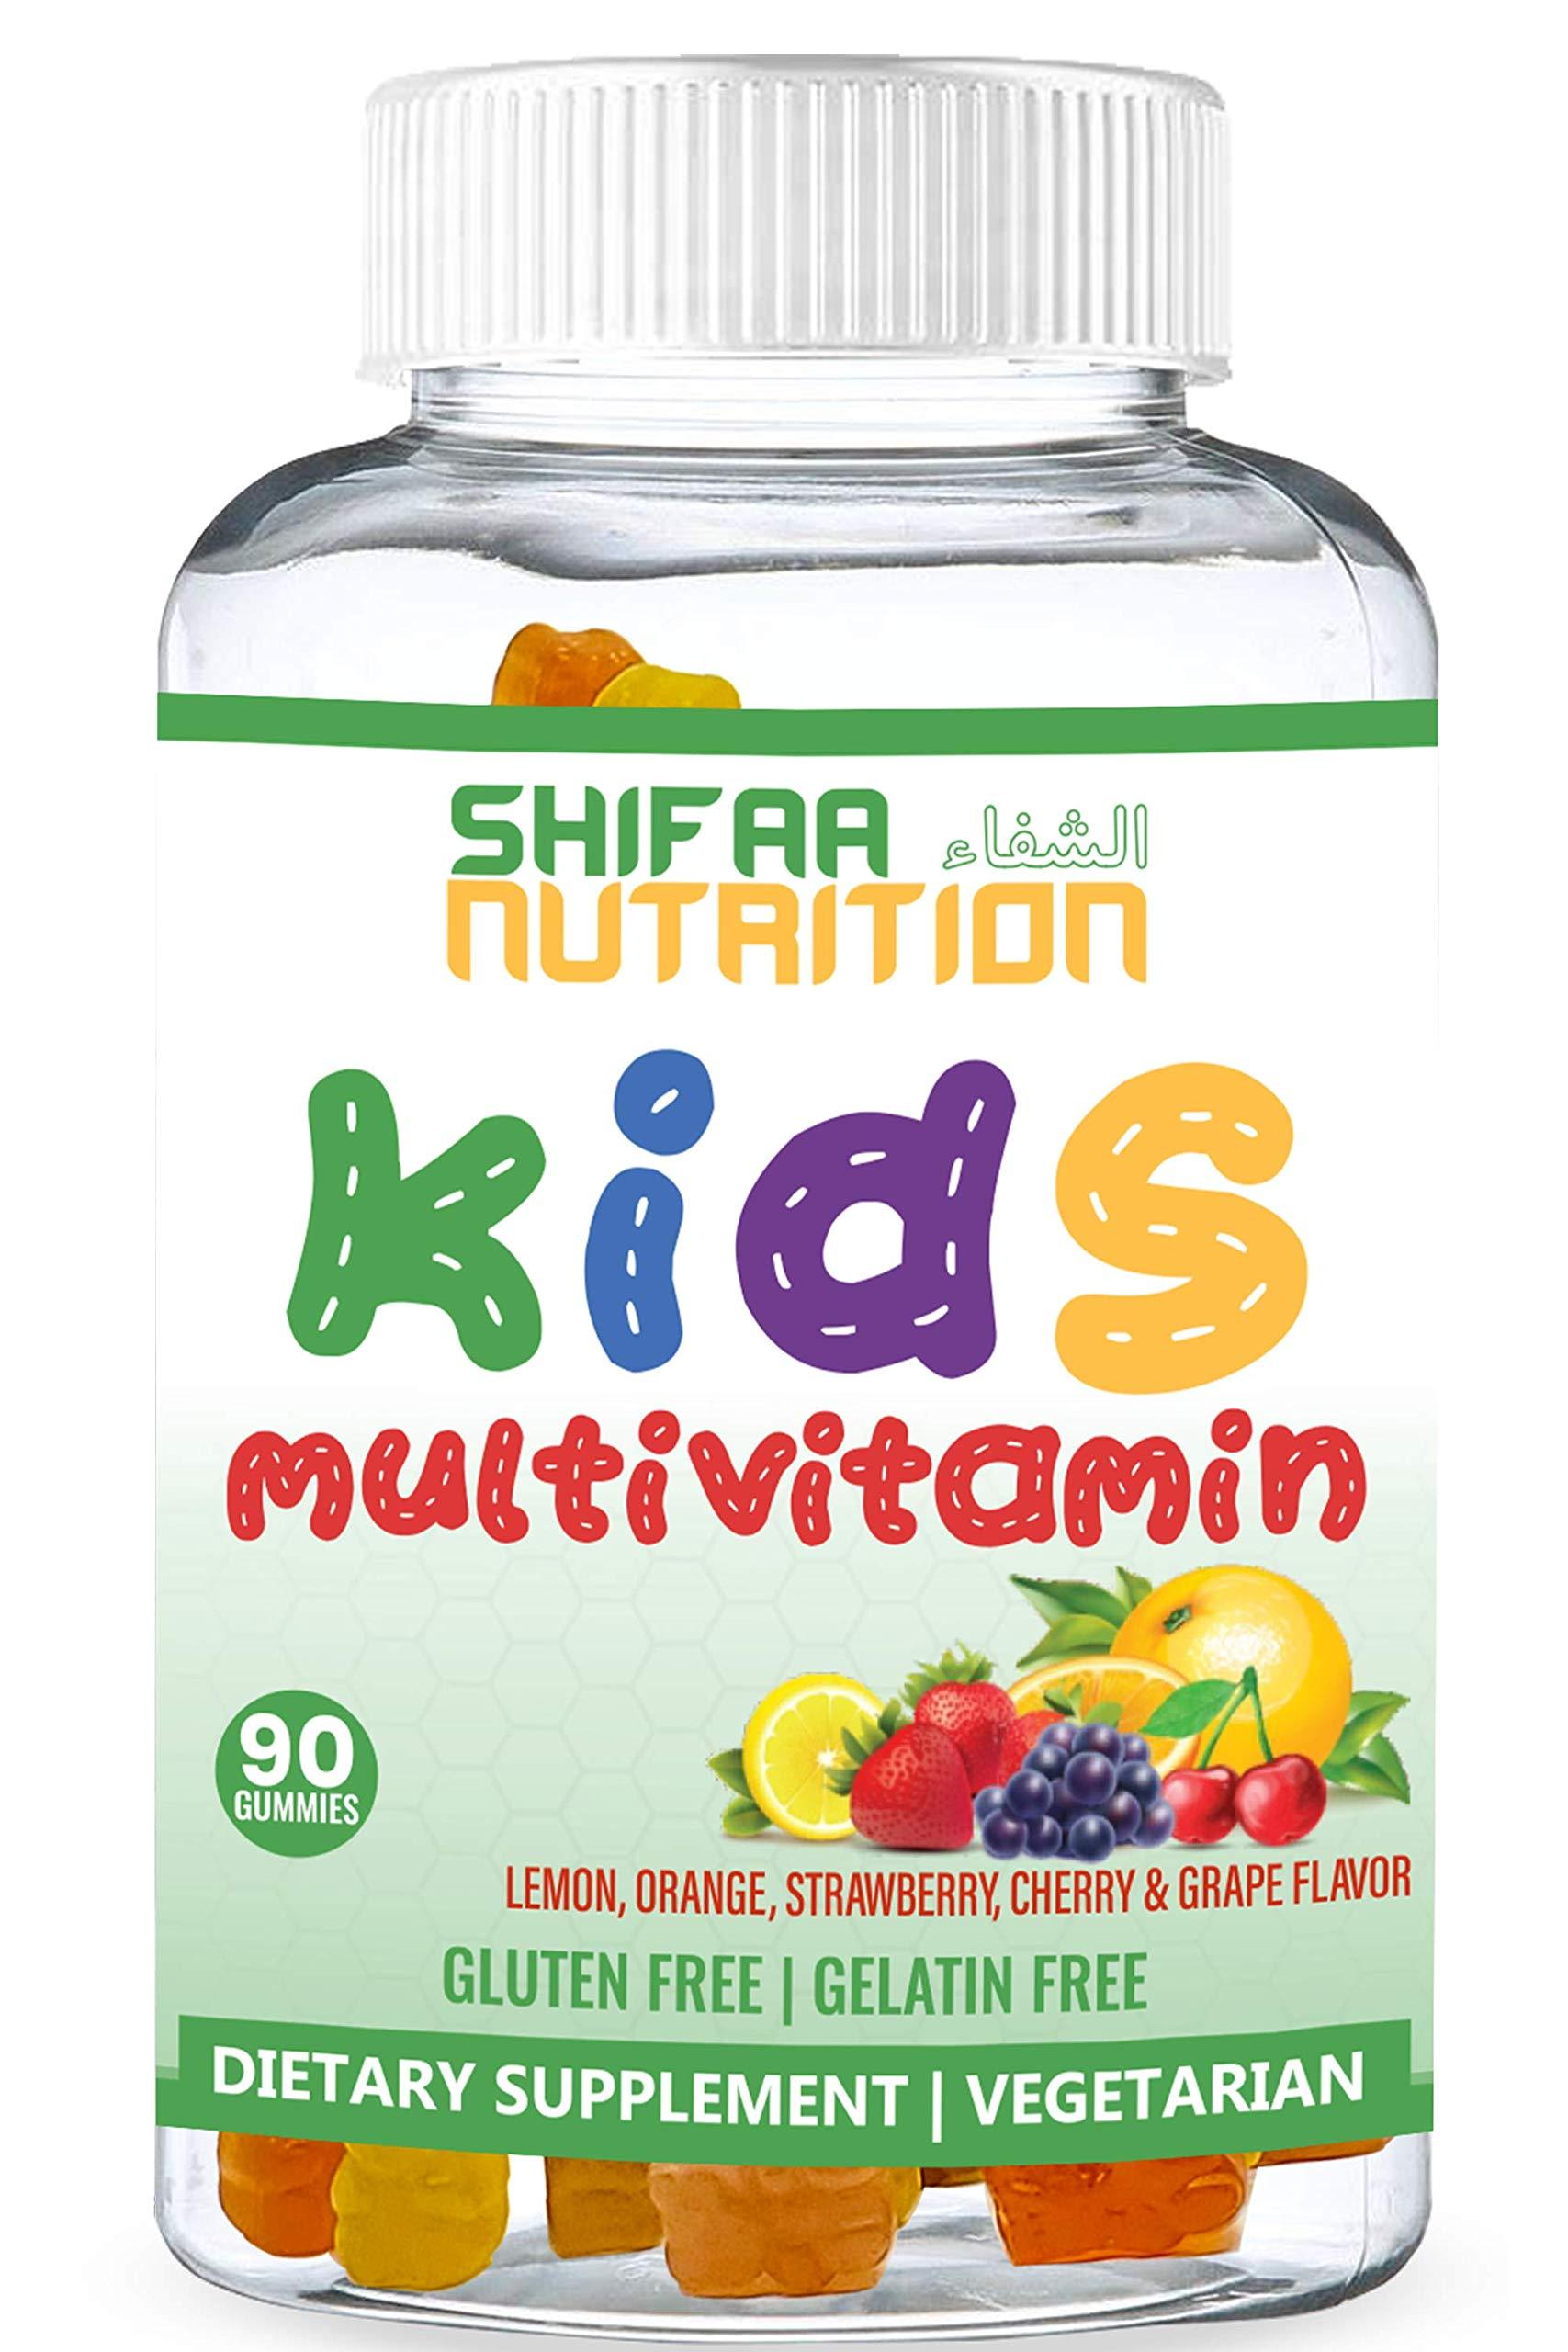 SHIFAA NUTRITION Halal & Vegetarian Gummy Vitamins for Kids   13 Vitamins, Minerals & Antioxidants for Children   Natural & Free of Gelatin Gluten Dairy Eggs Peanuts Soy   Halal Vitamins   90 Gummies